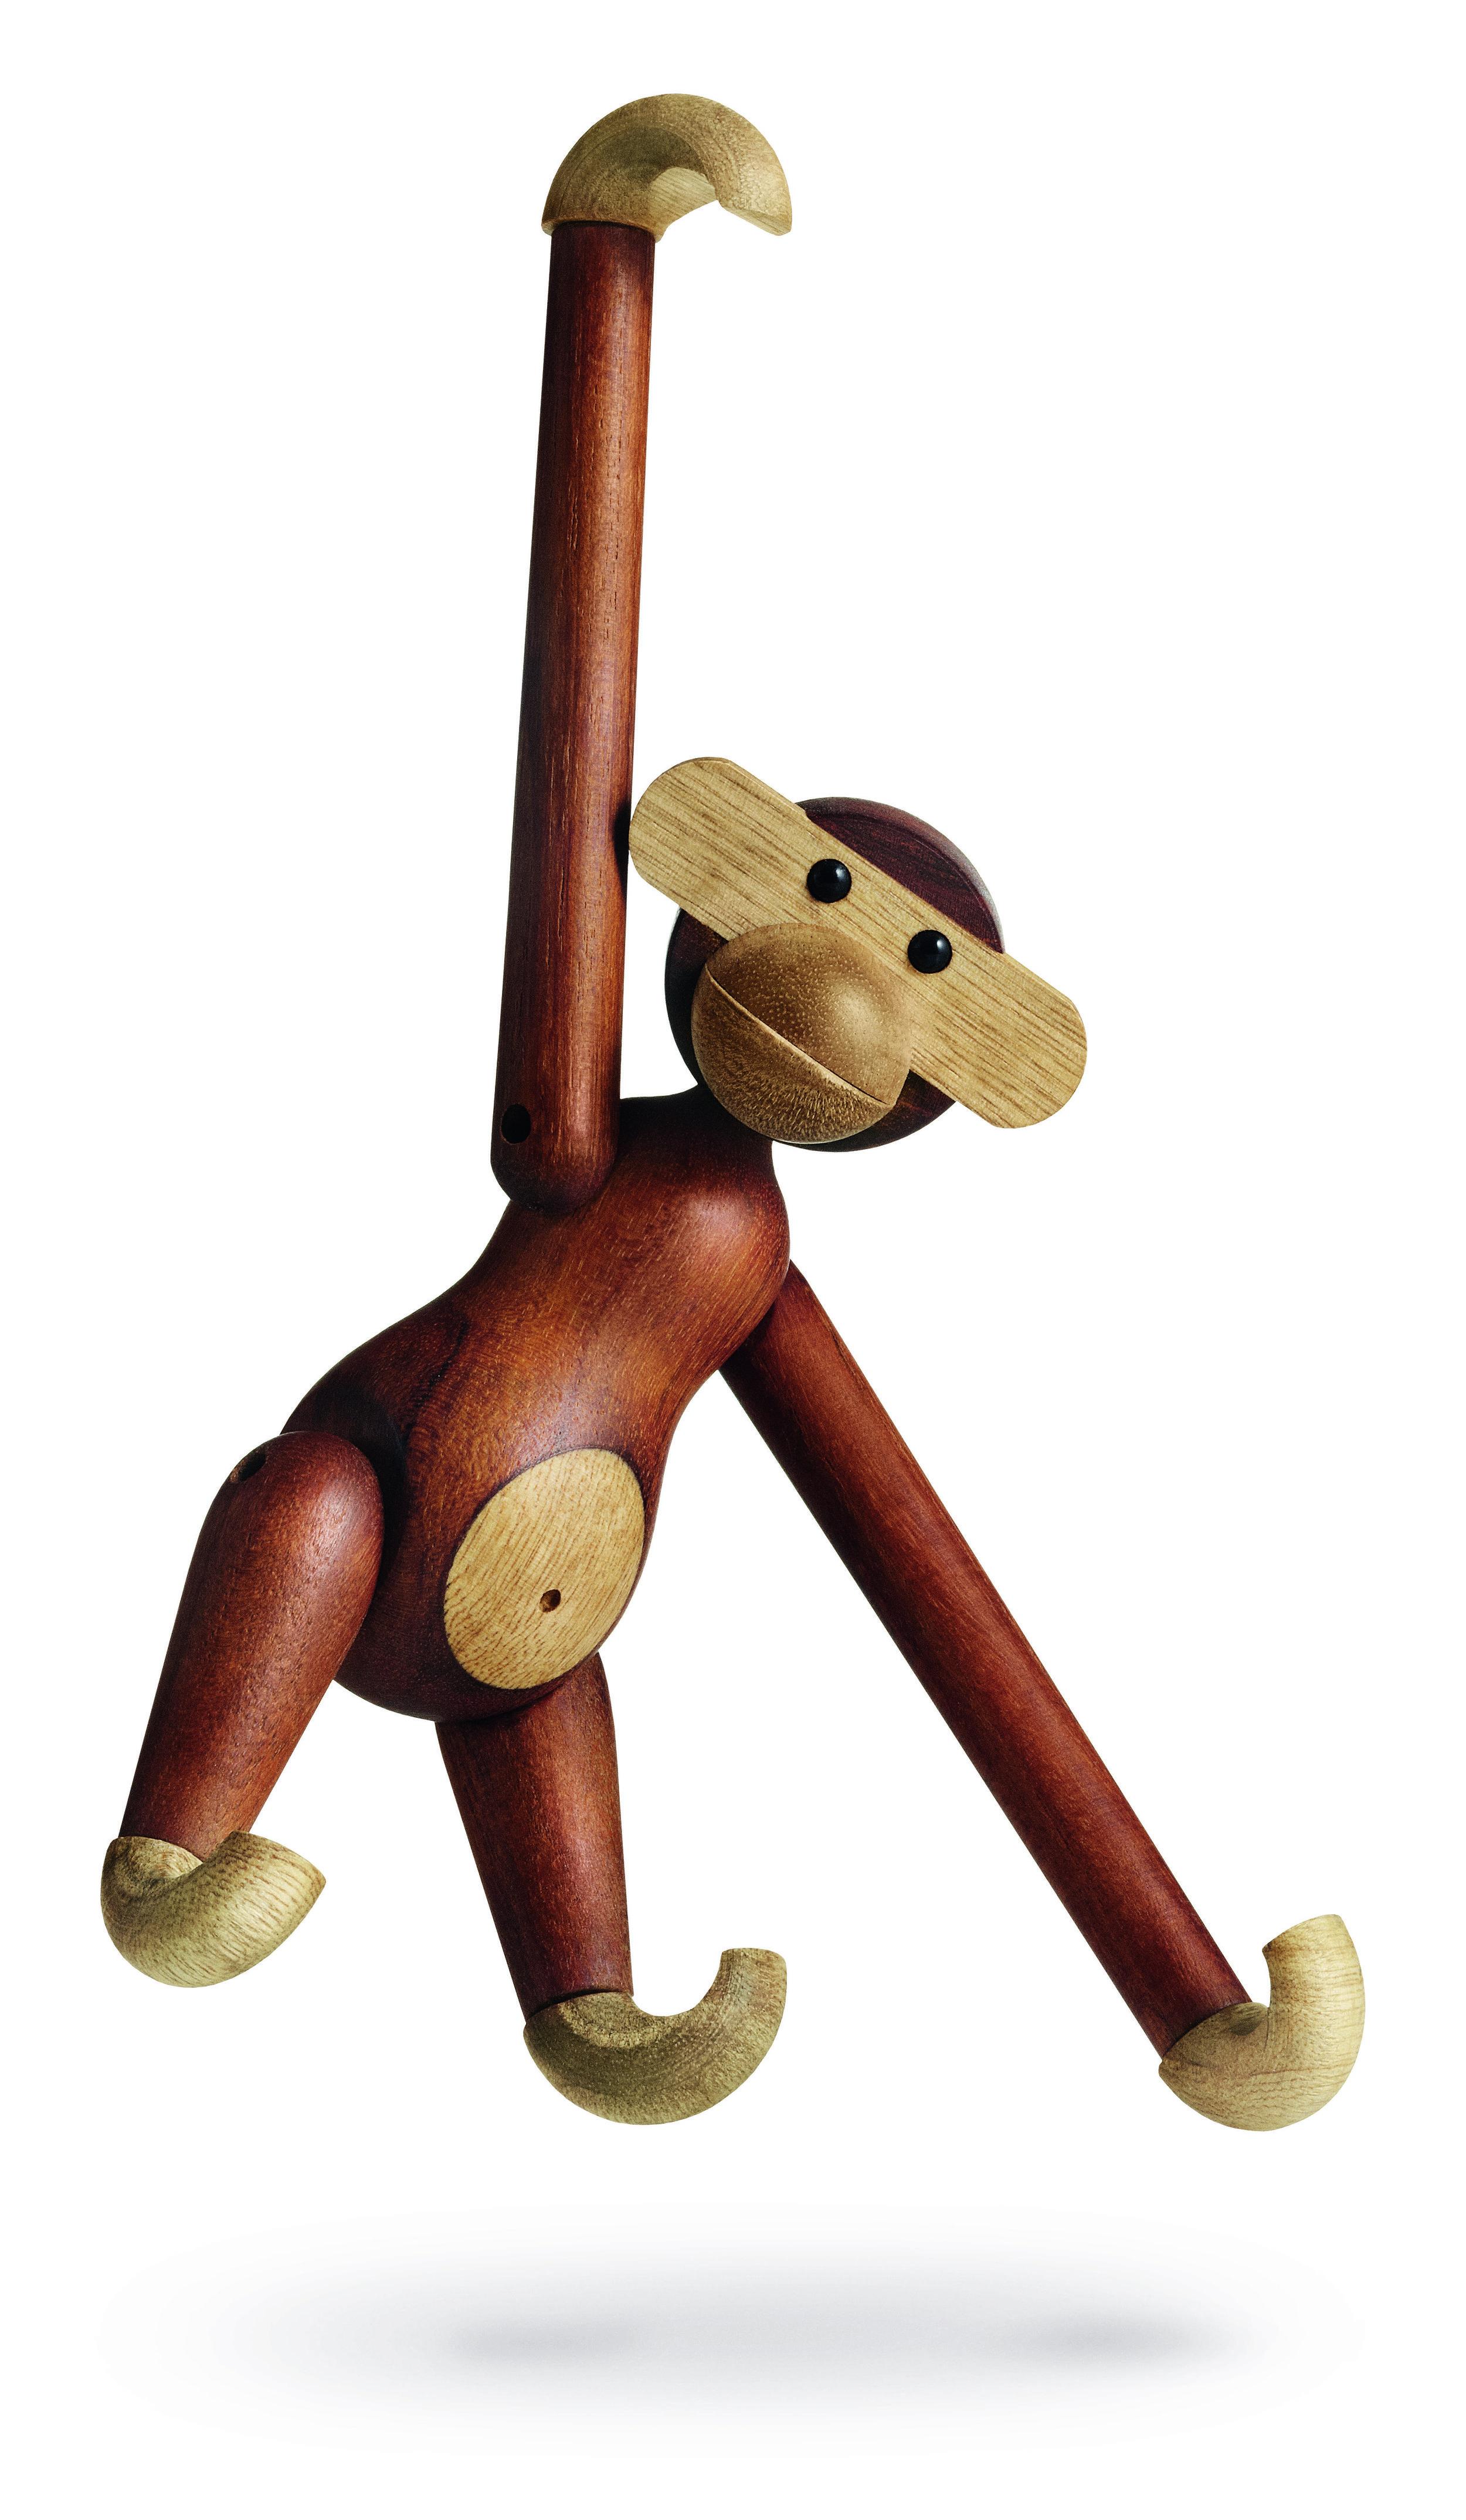 Wooden Monkey toy figurine by Kay Bojesen.   Photo courtesy of    vam.ac.uk